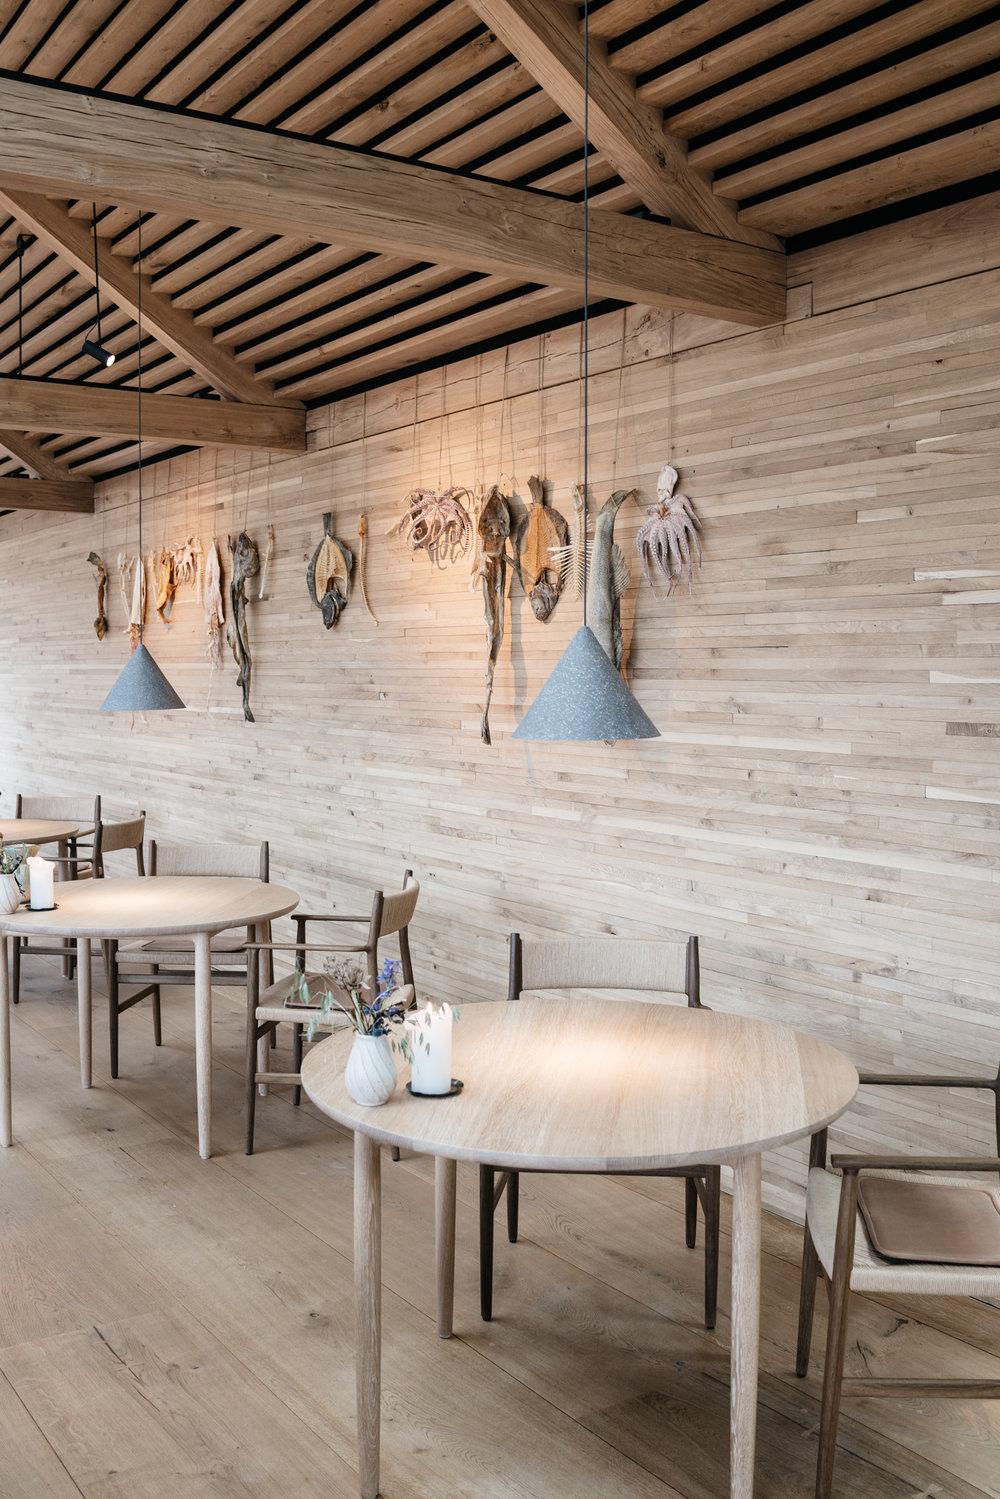 Noma, Copenhagen   editorial for the alifewortheating food blog on the Newly re-opened danish restaurant by chef Renee redzepi in copenhagen, Noma.